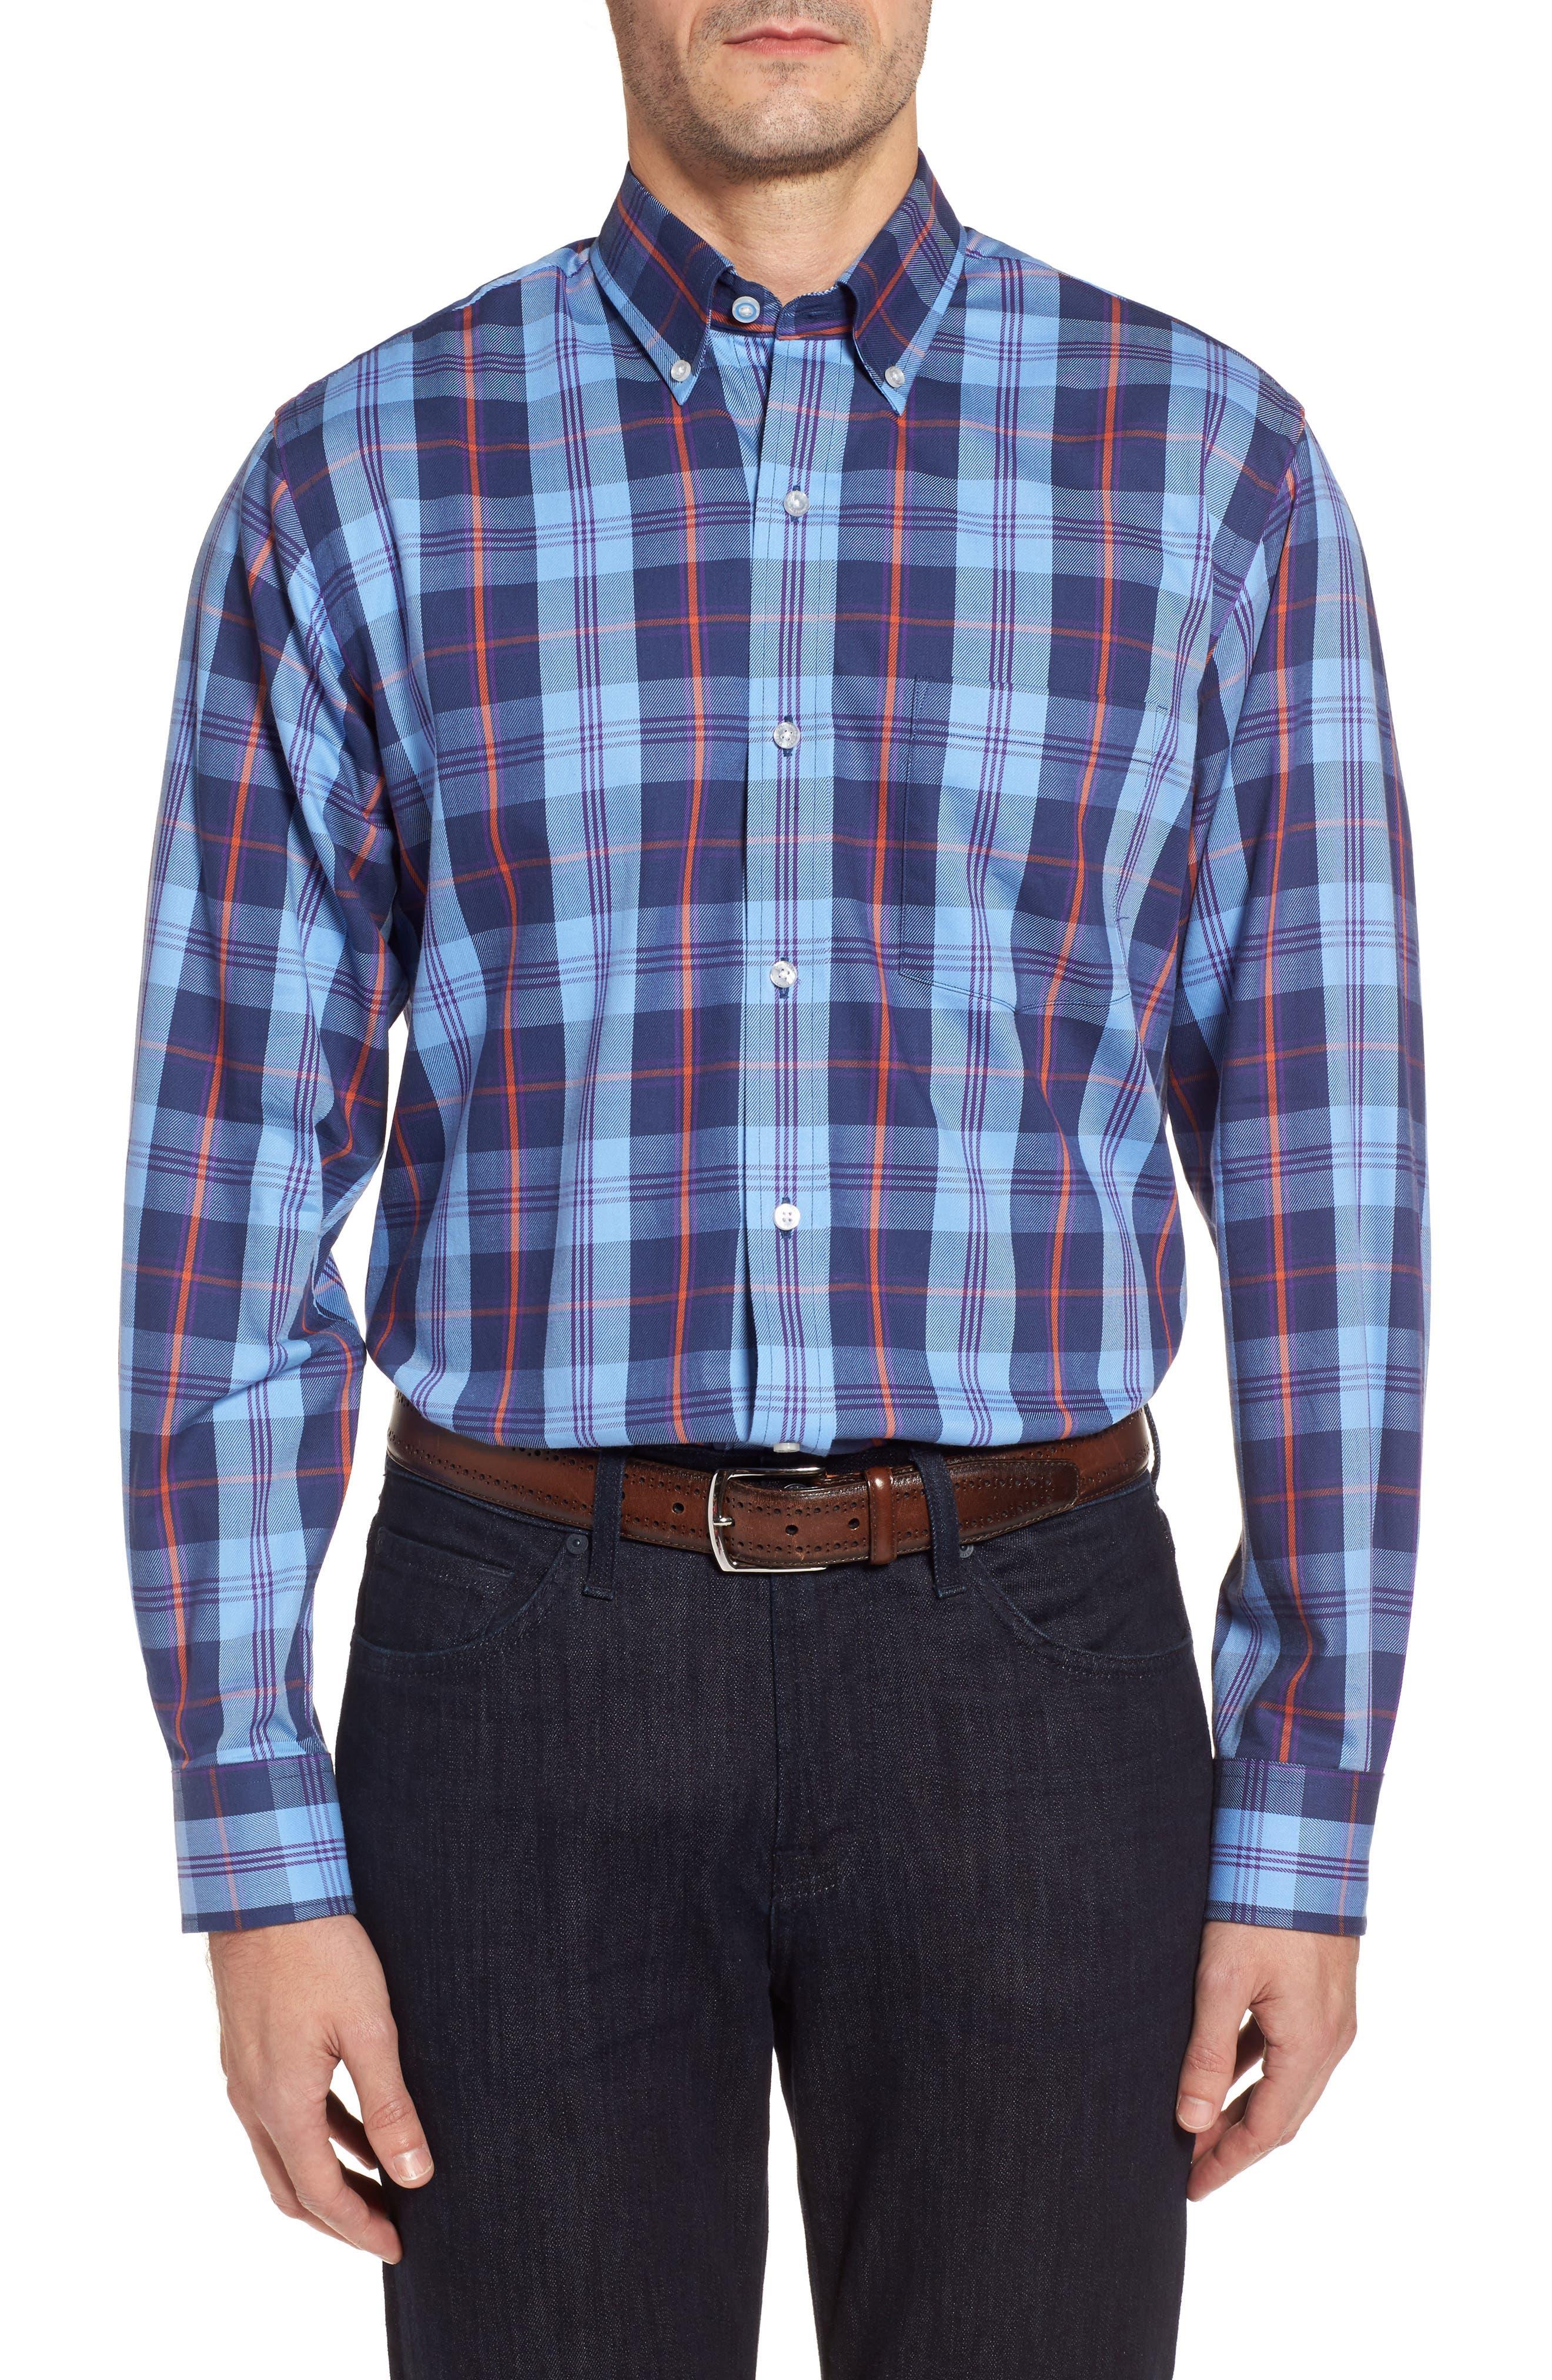 Main Image - TailorByrd Chauvin Regular Fit Plaid Sport Shirt